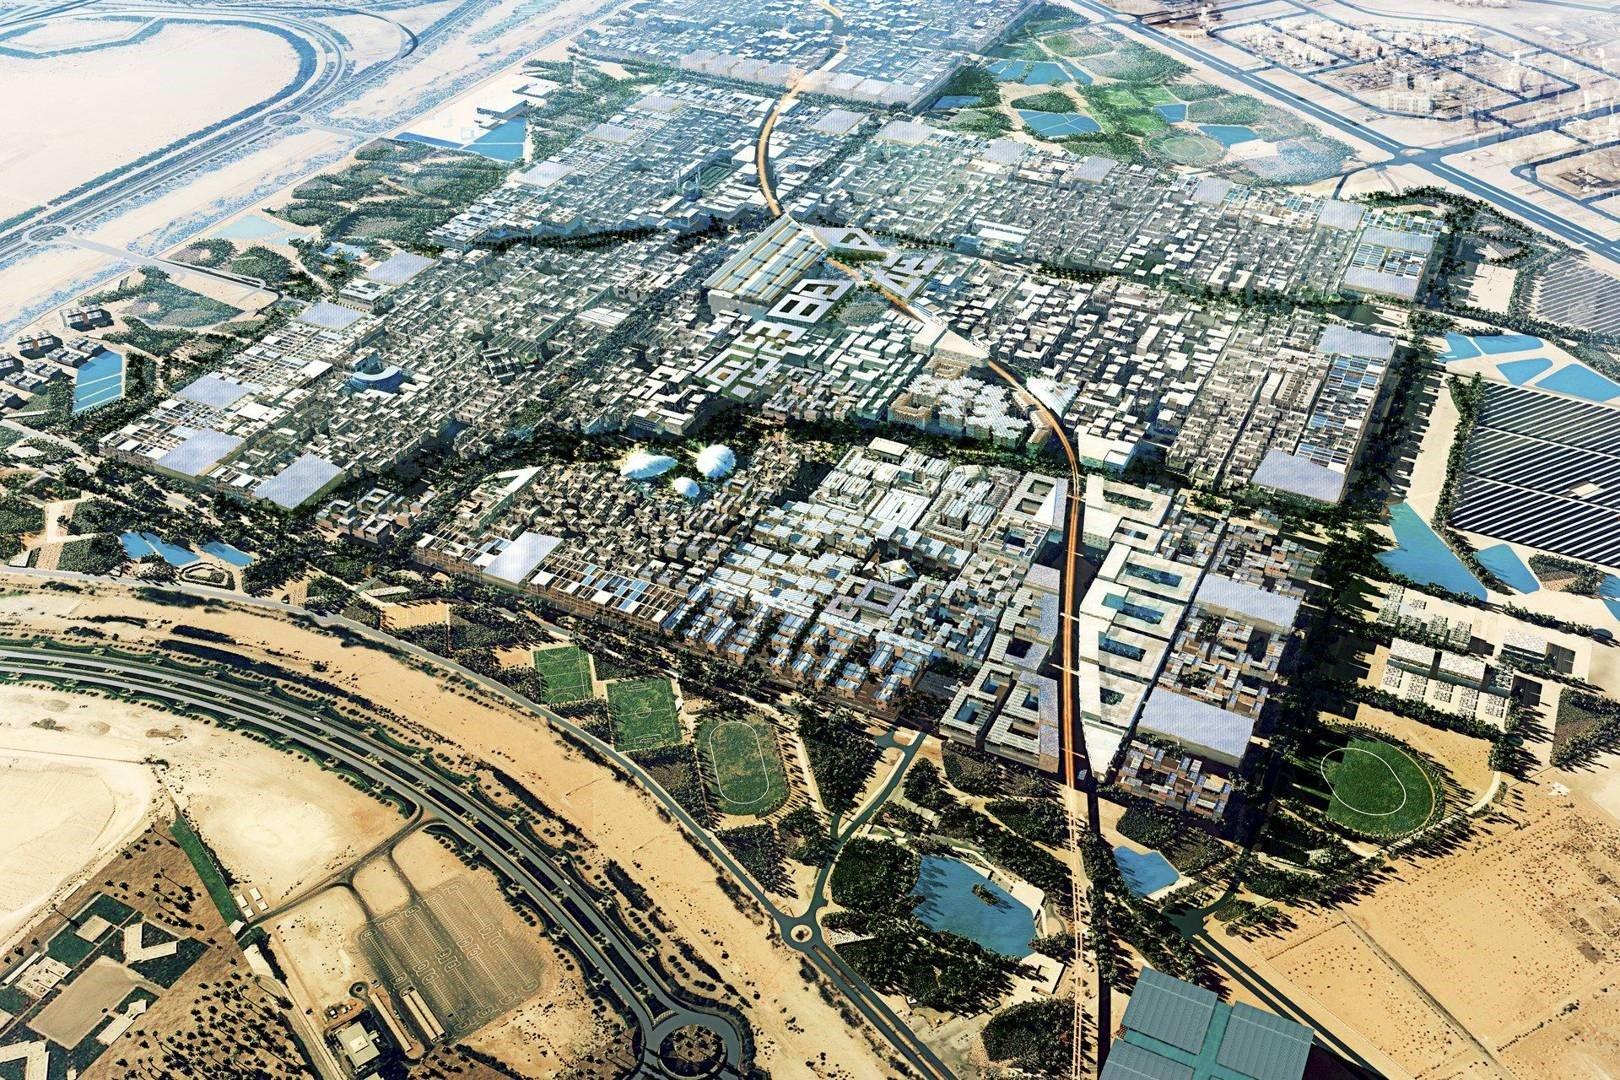 The Futuristic Masdar City, Abu Dhabi